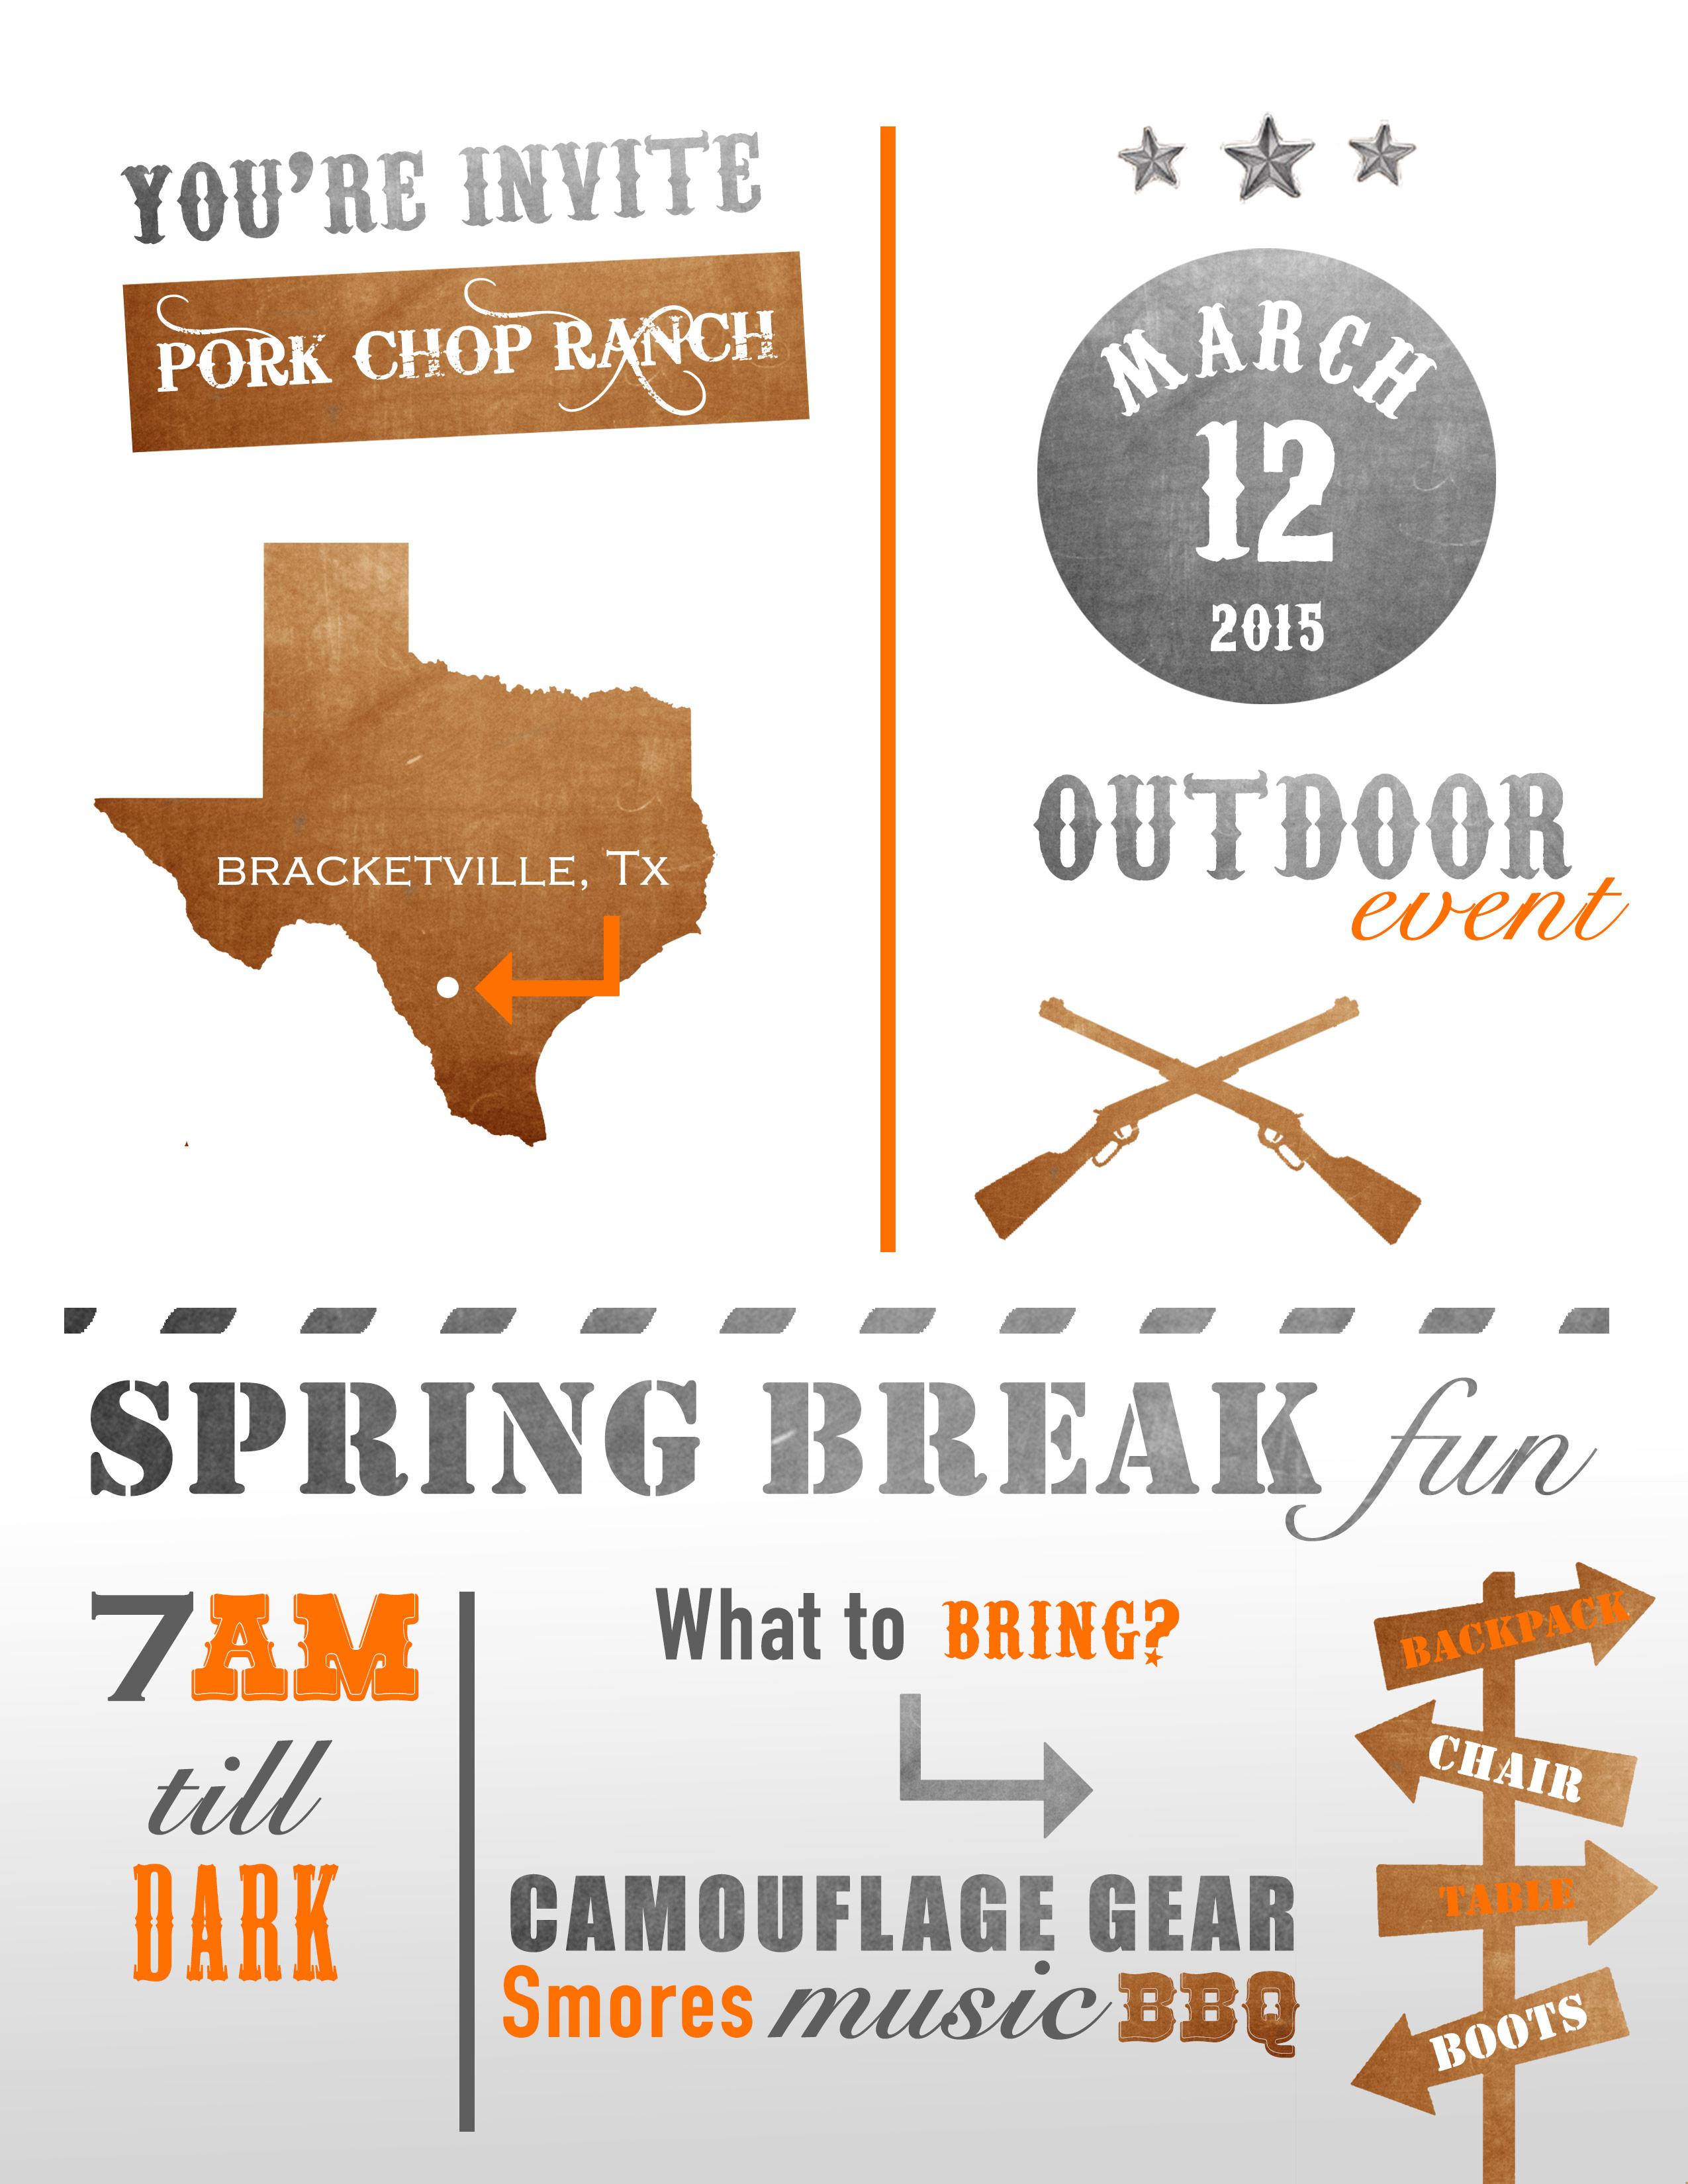 Springbreak 2015 Flyer